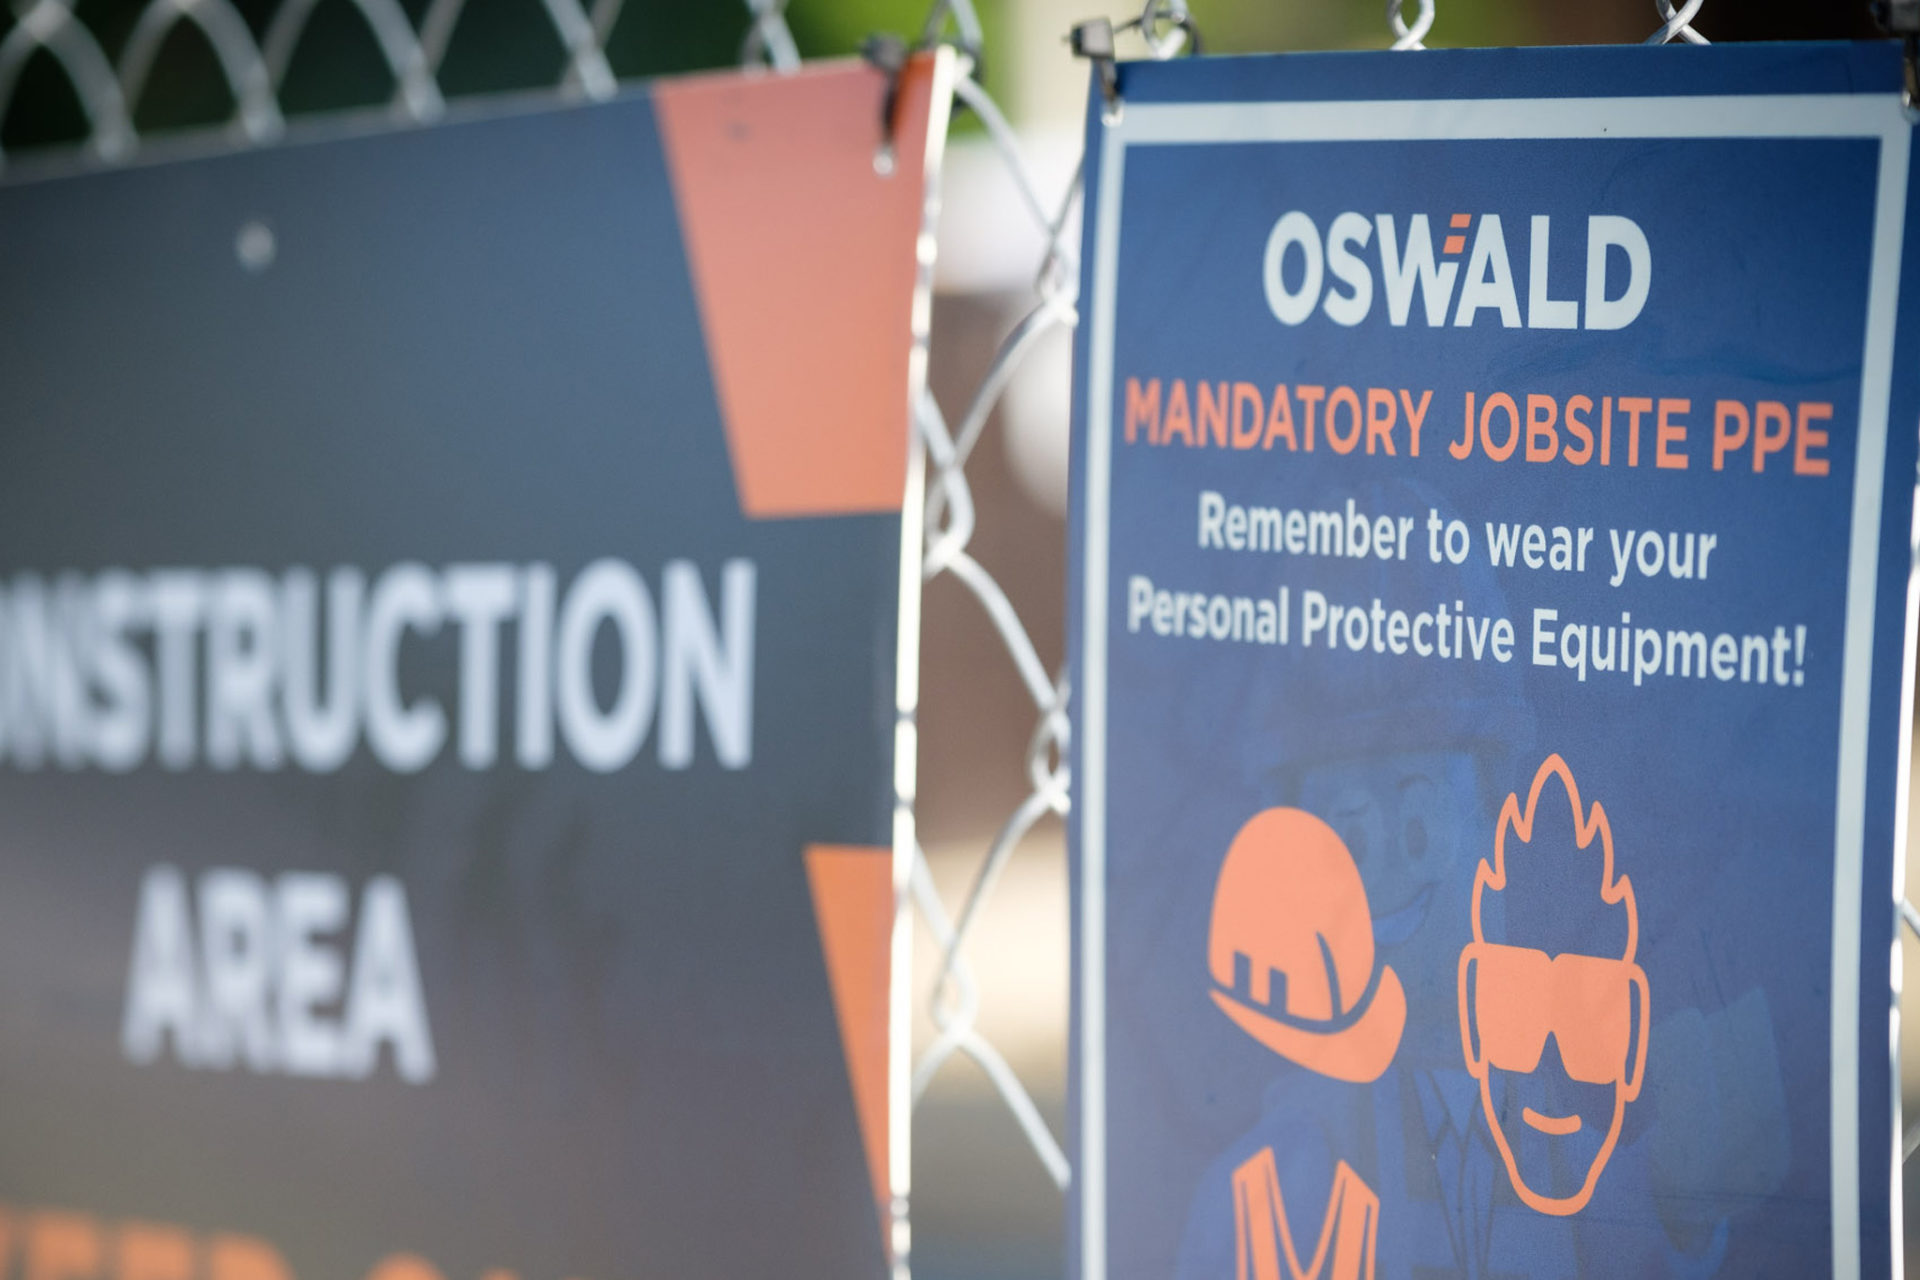 Oswald Safety